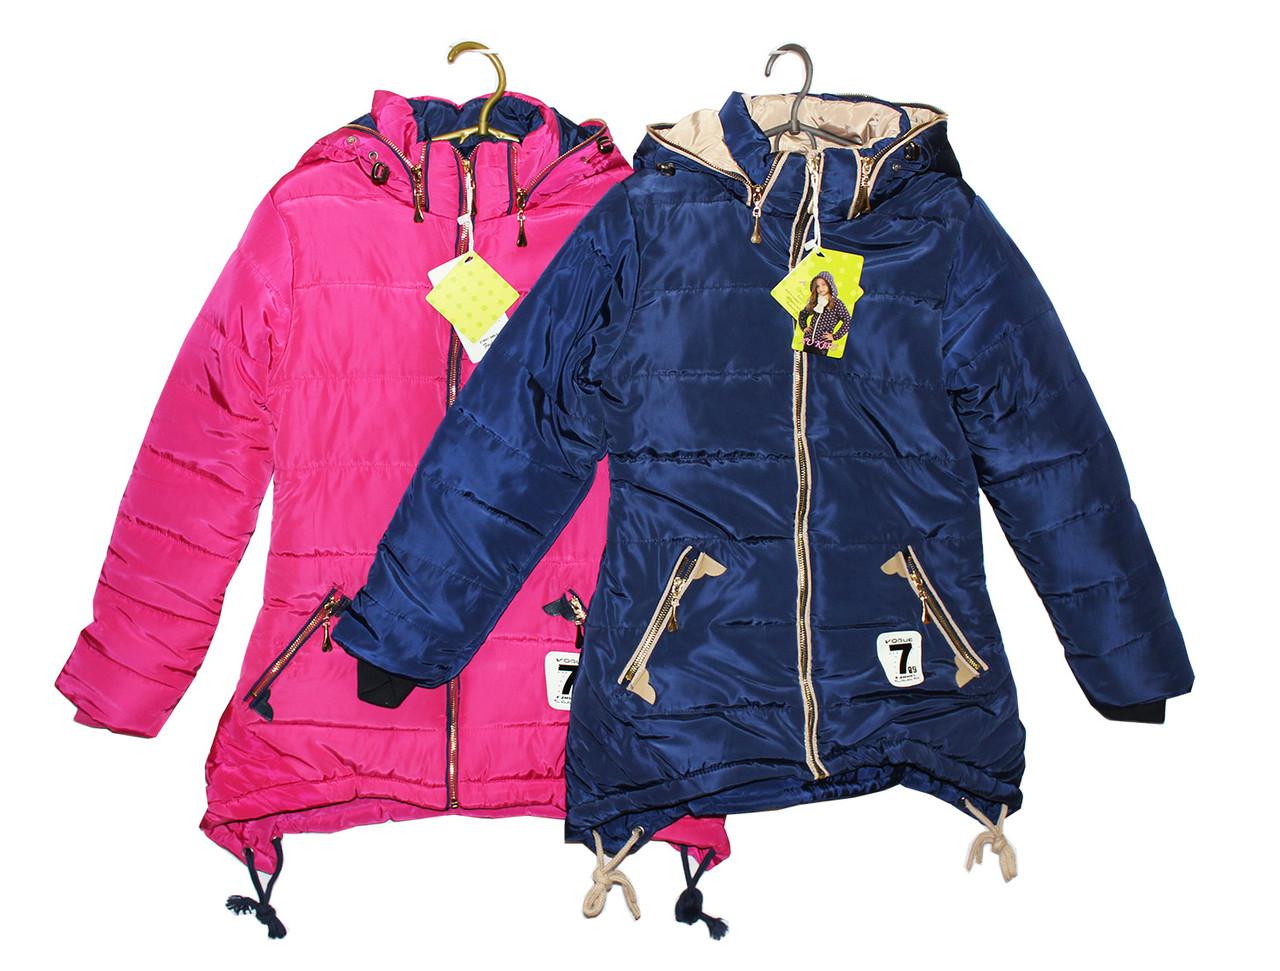 Куртка подростковая для девочки на зиму Р - 27